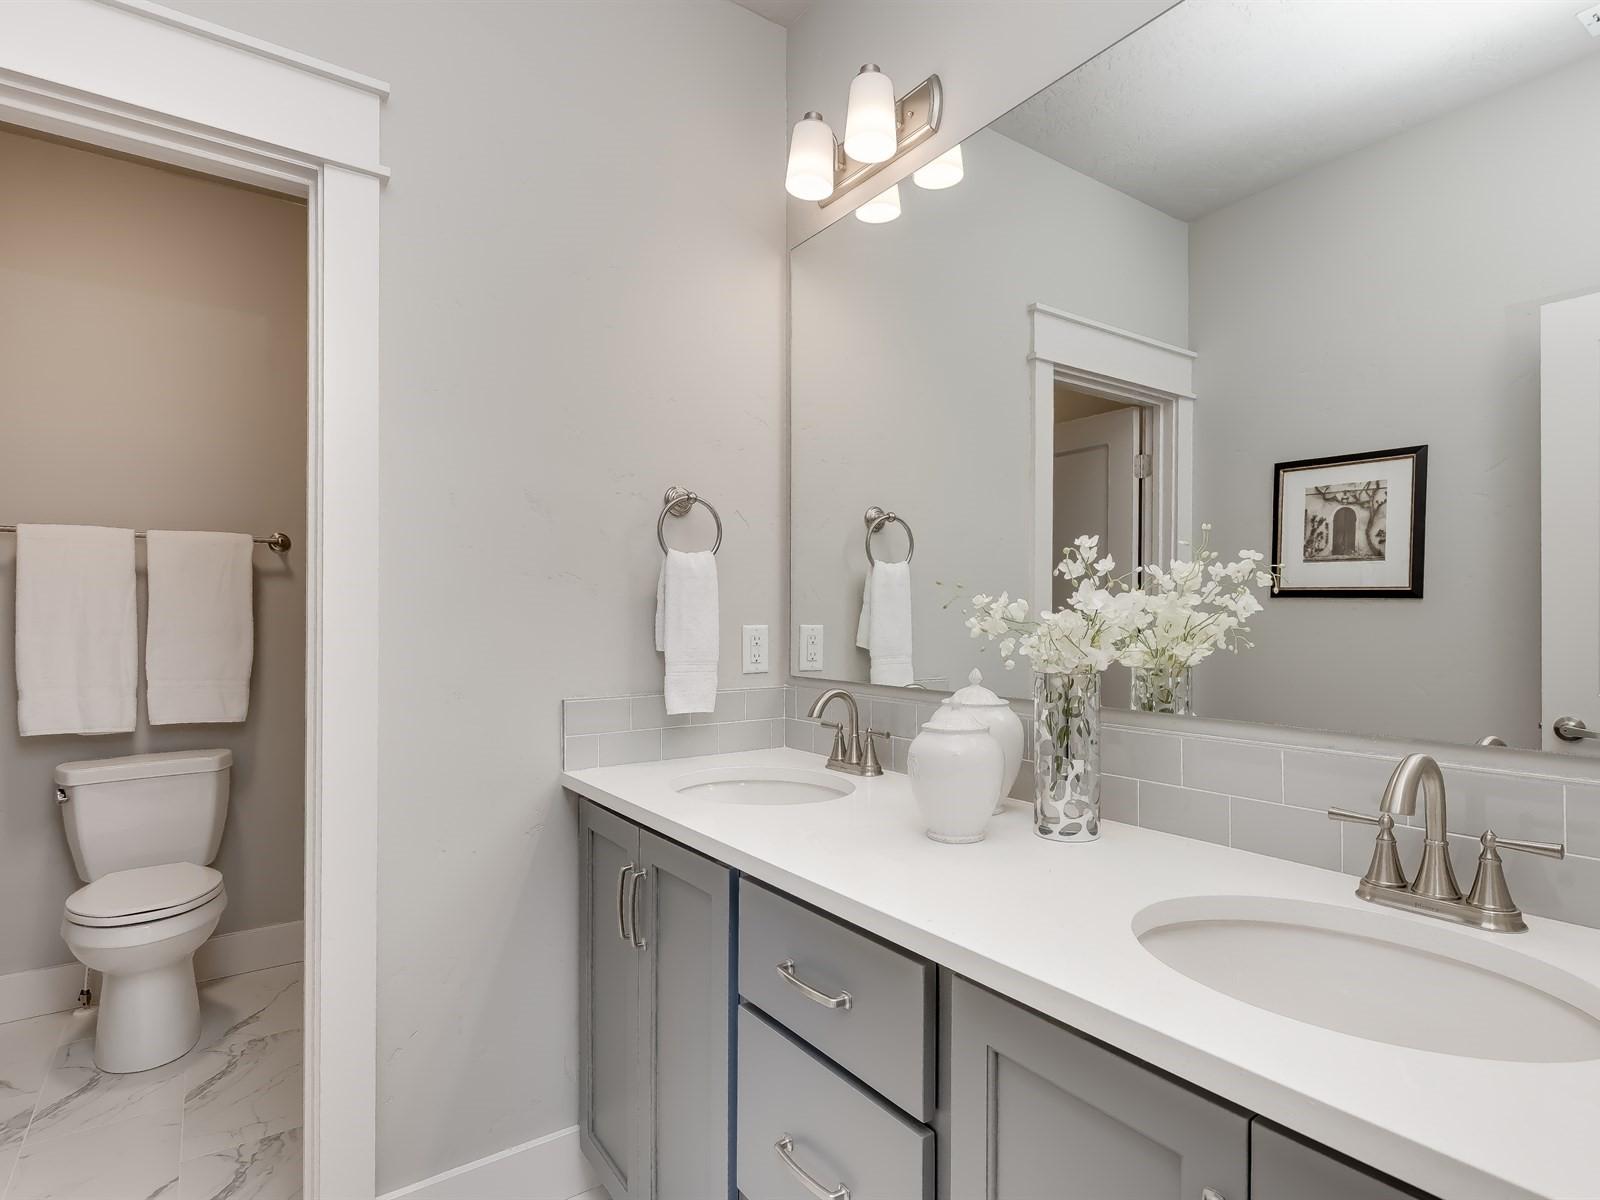 030_Bathroom .jpg